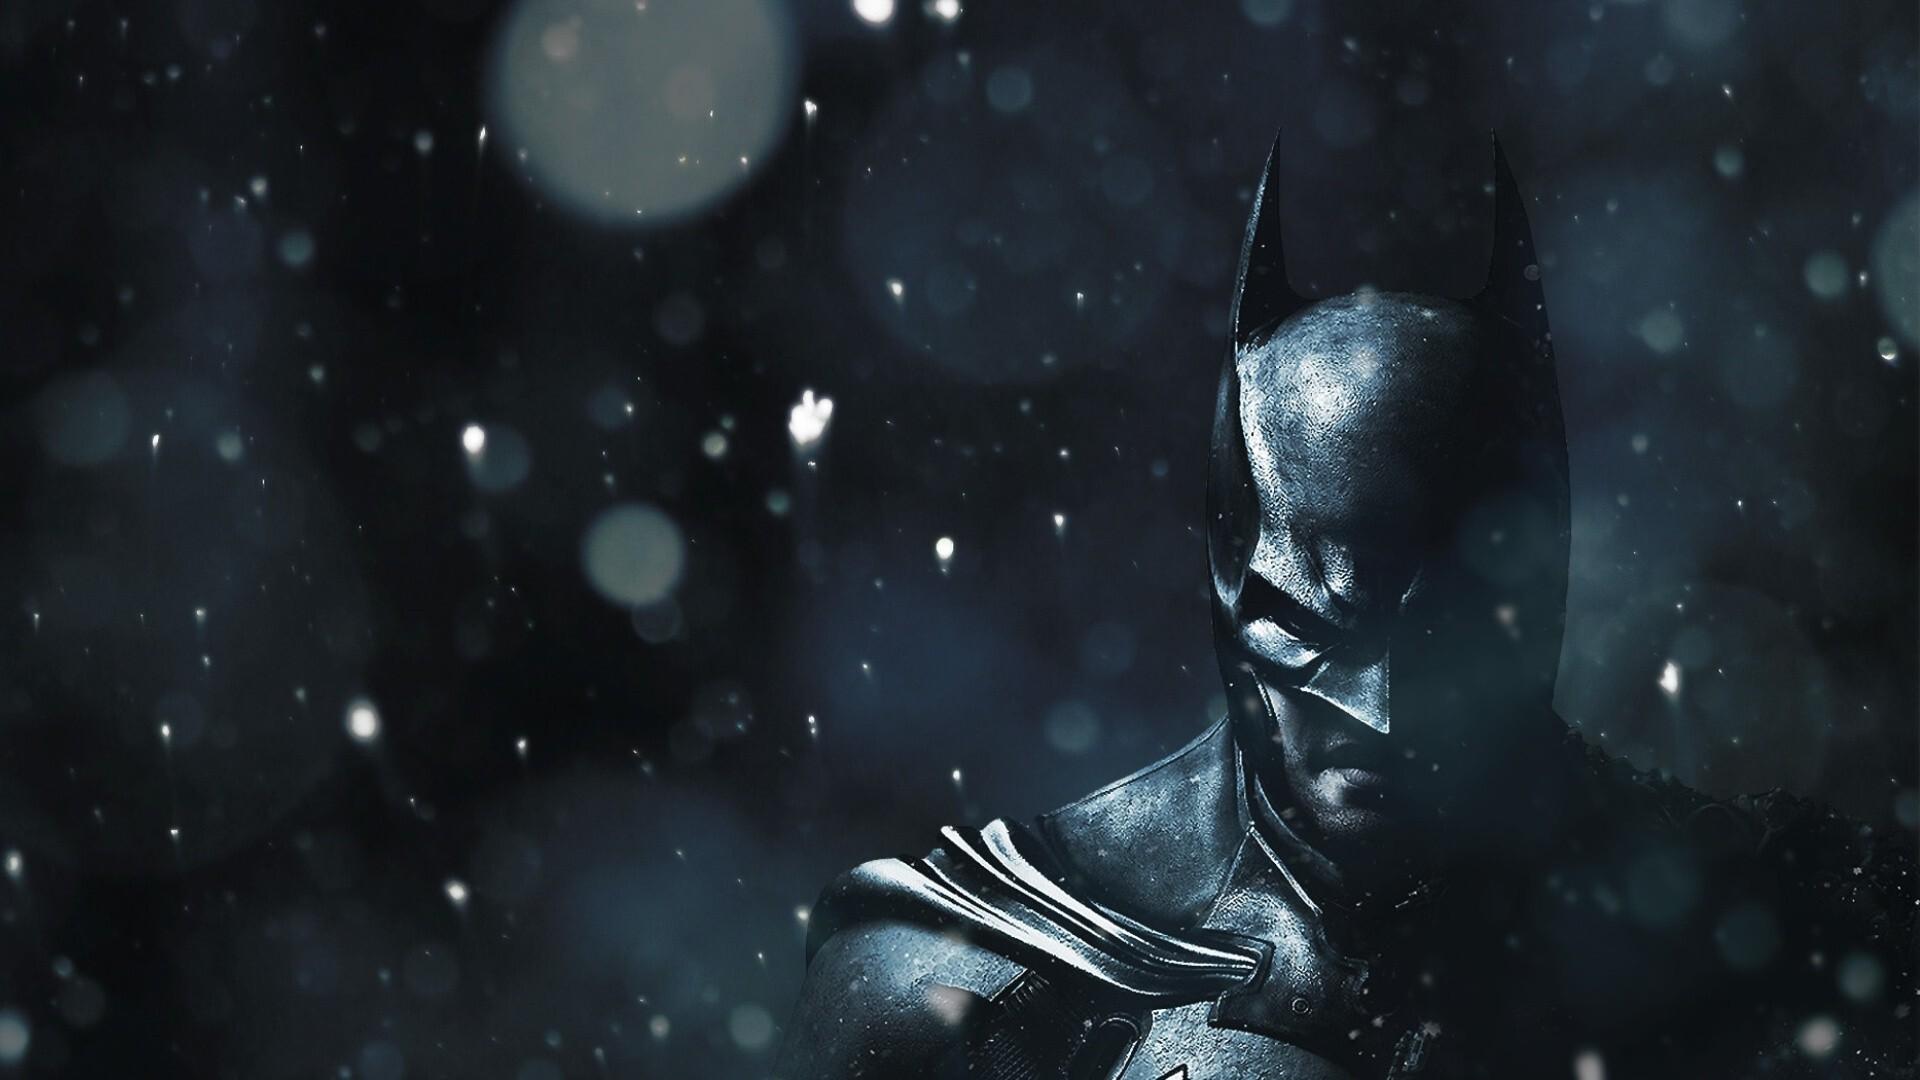 1920x1080 Batman Arkham Origins Laptop Full Hd 1080p Hd 4k